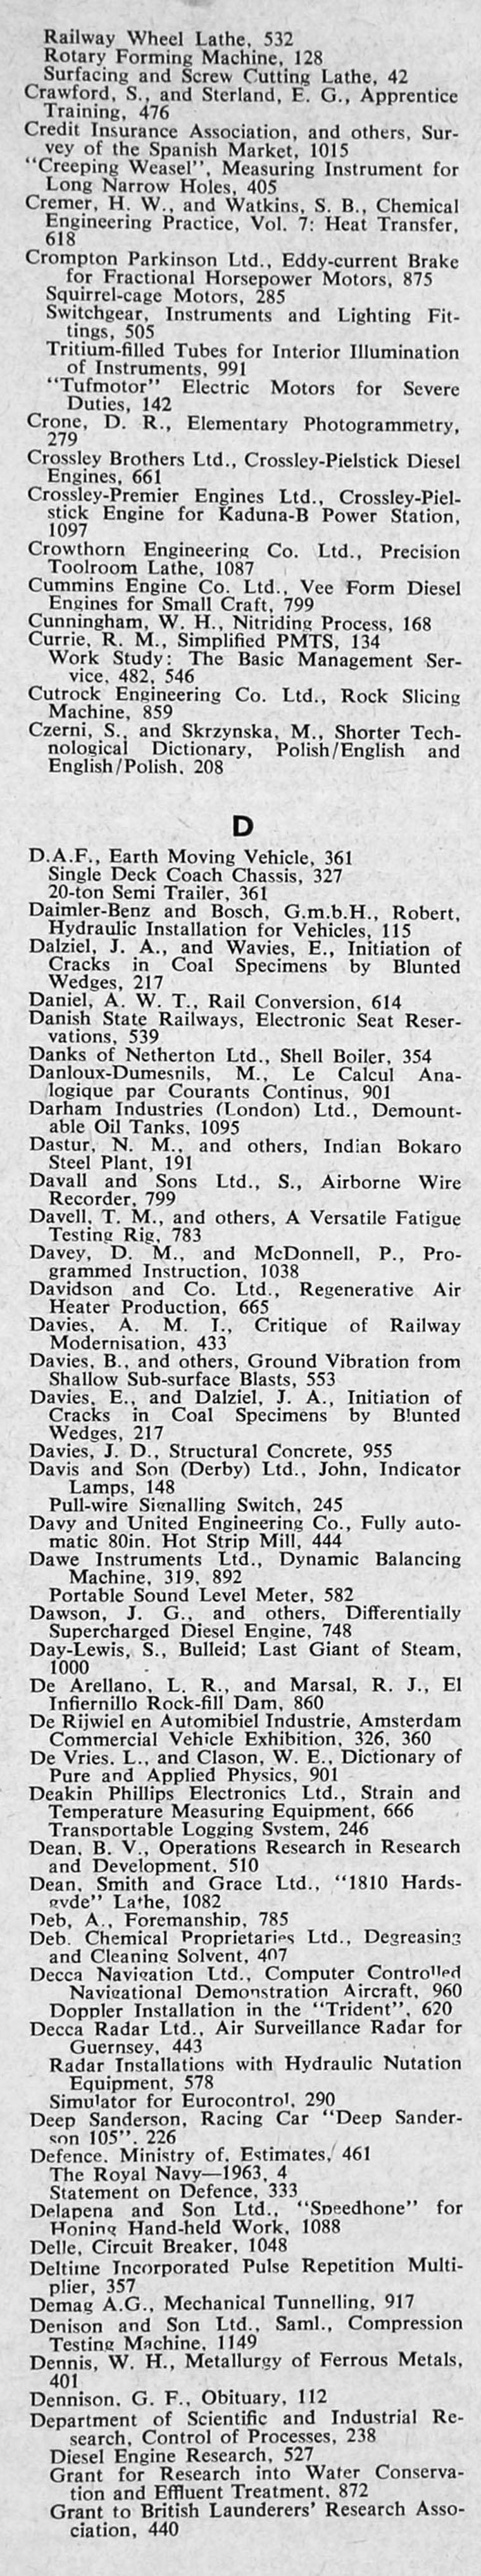 The Engineer 1964 Jan Jun Index Mirror Wiring Diagram 955 671 Dorman